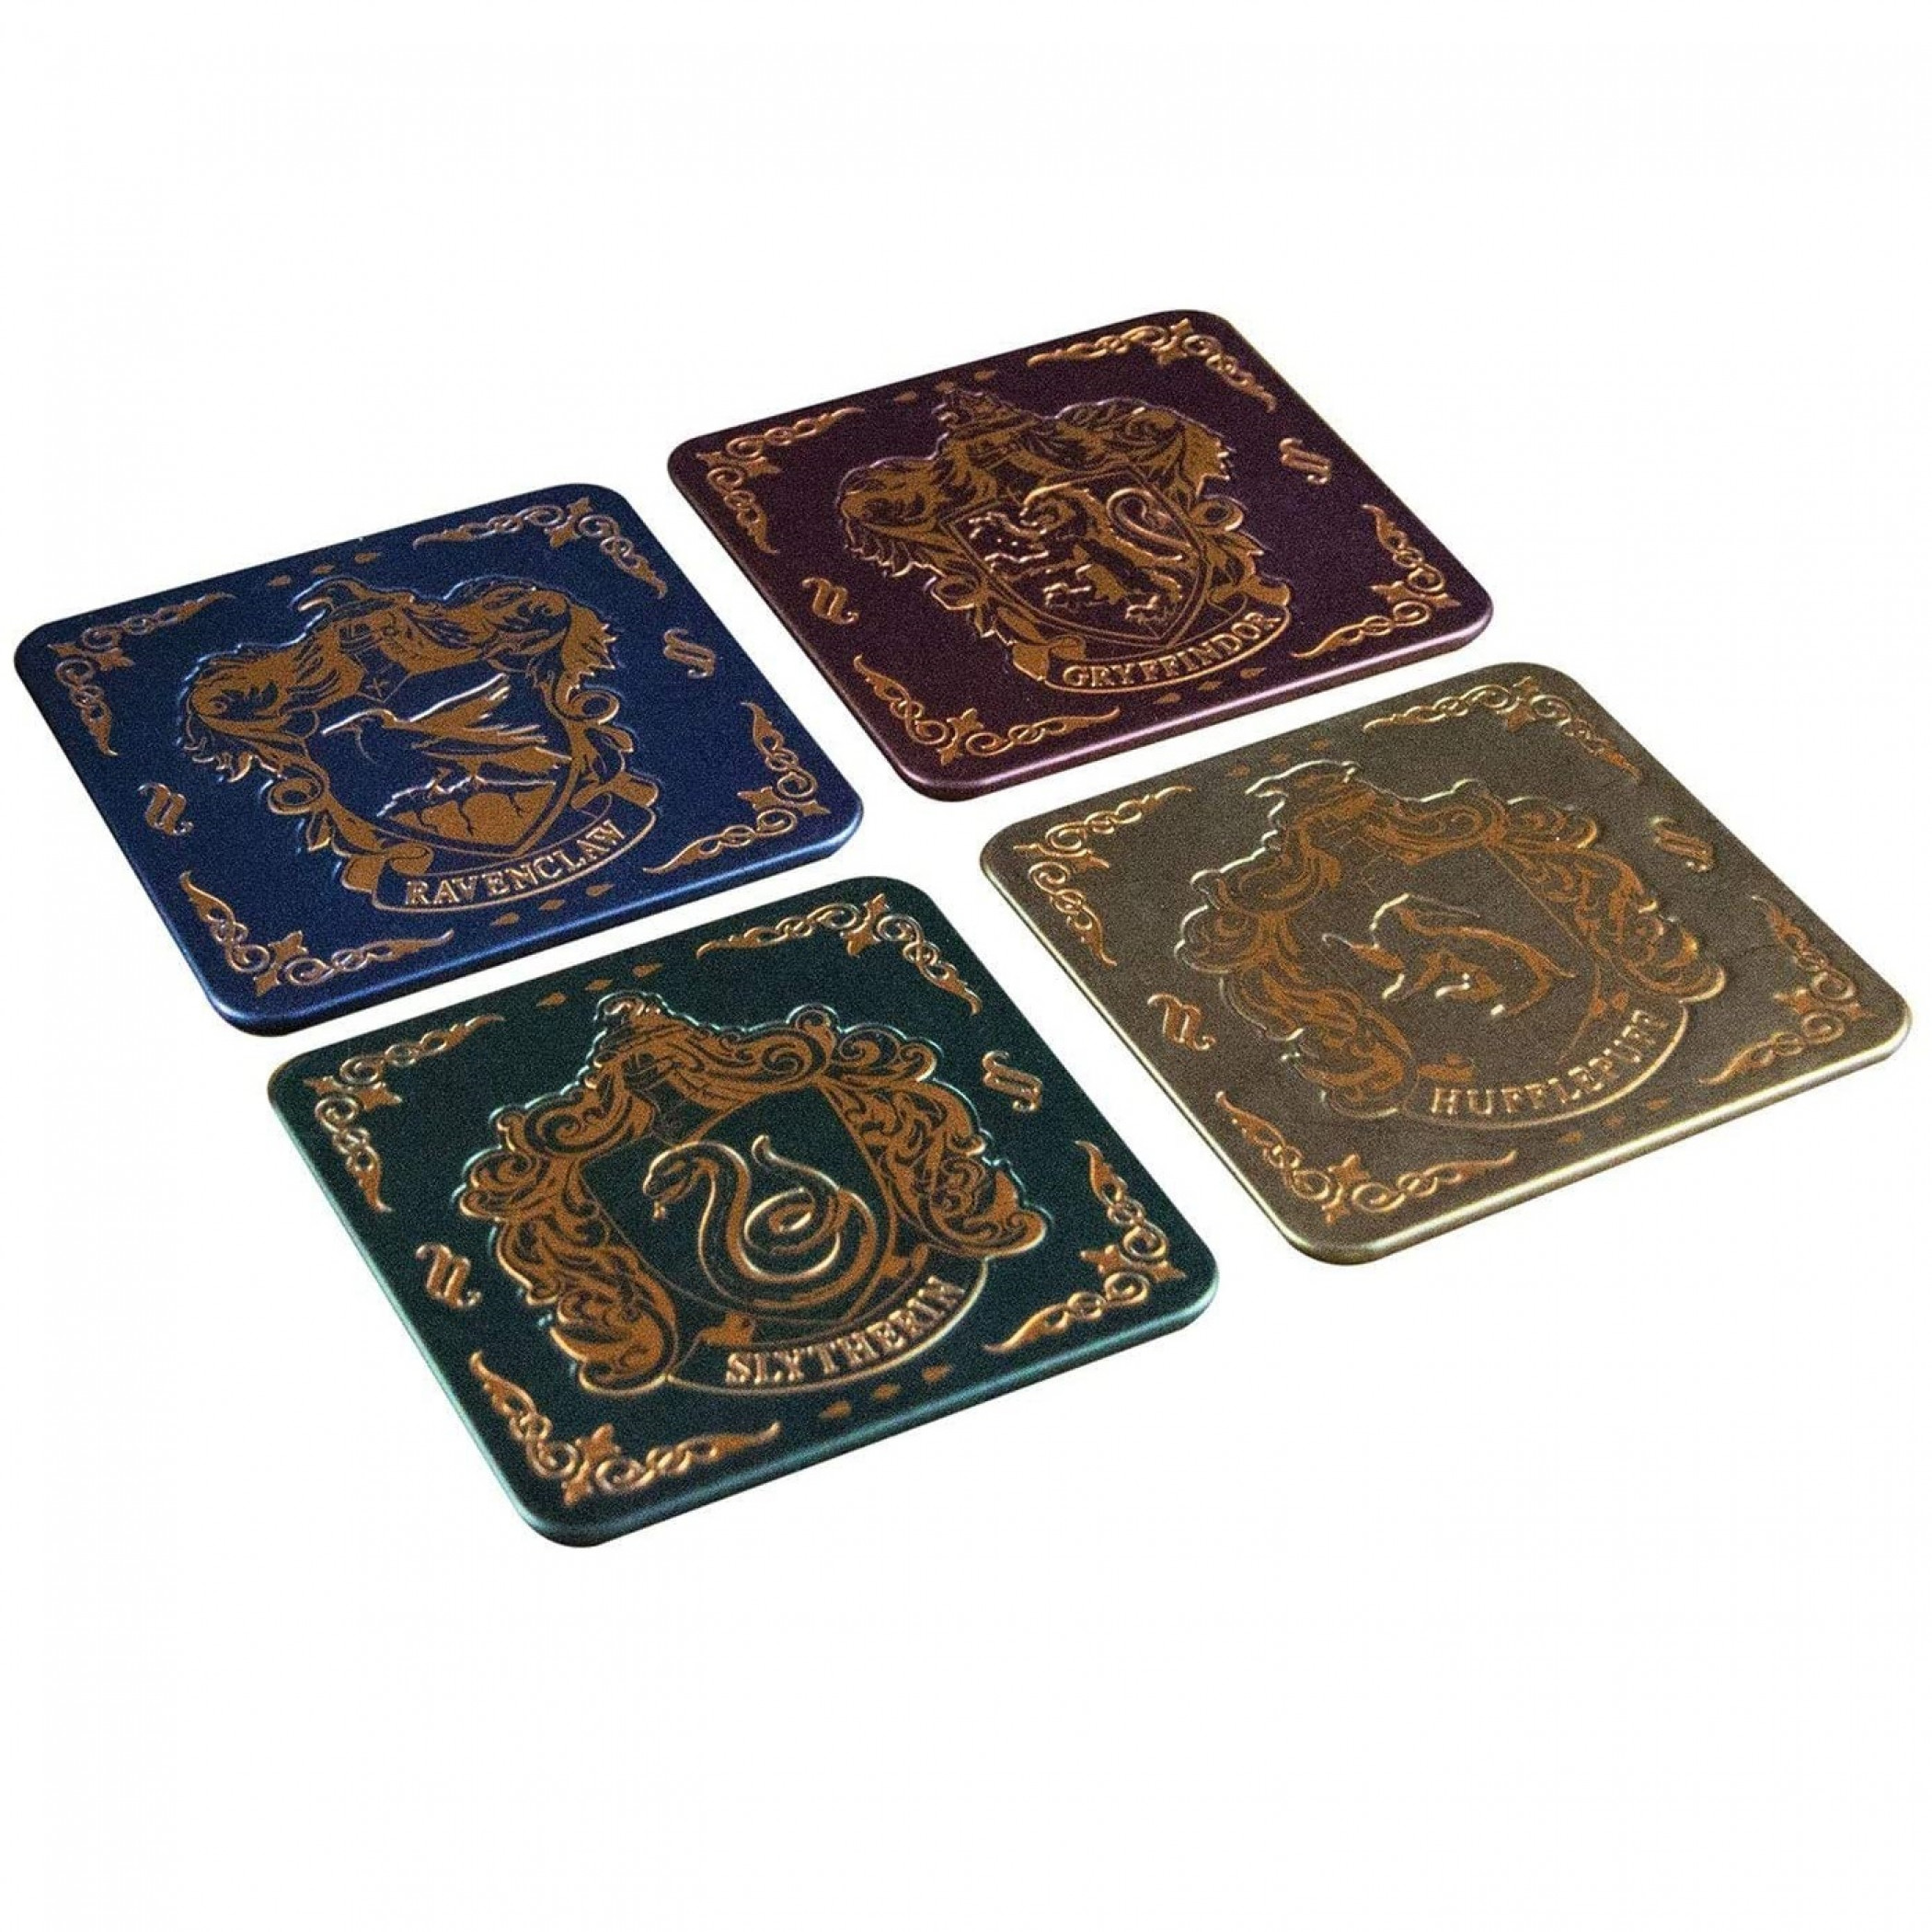 Harry Potter Hogwarts Crest Coasters